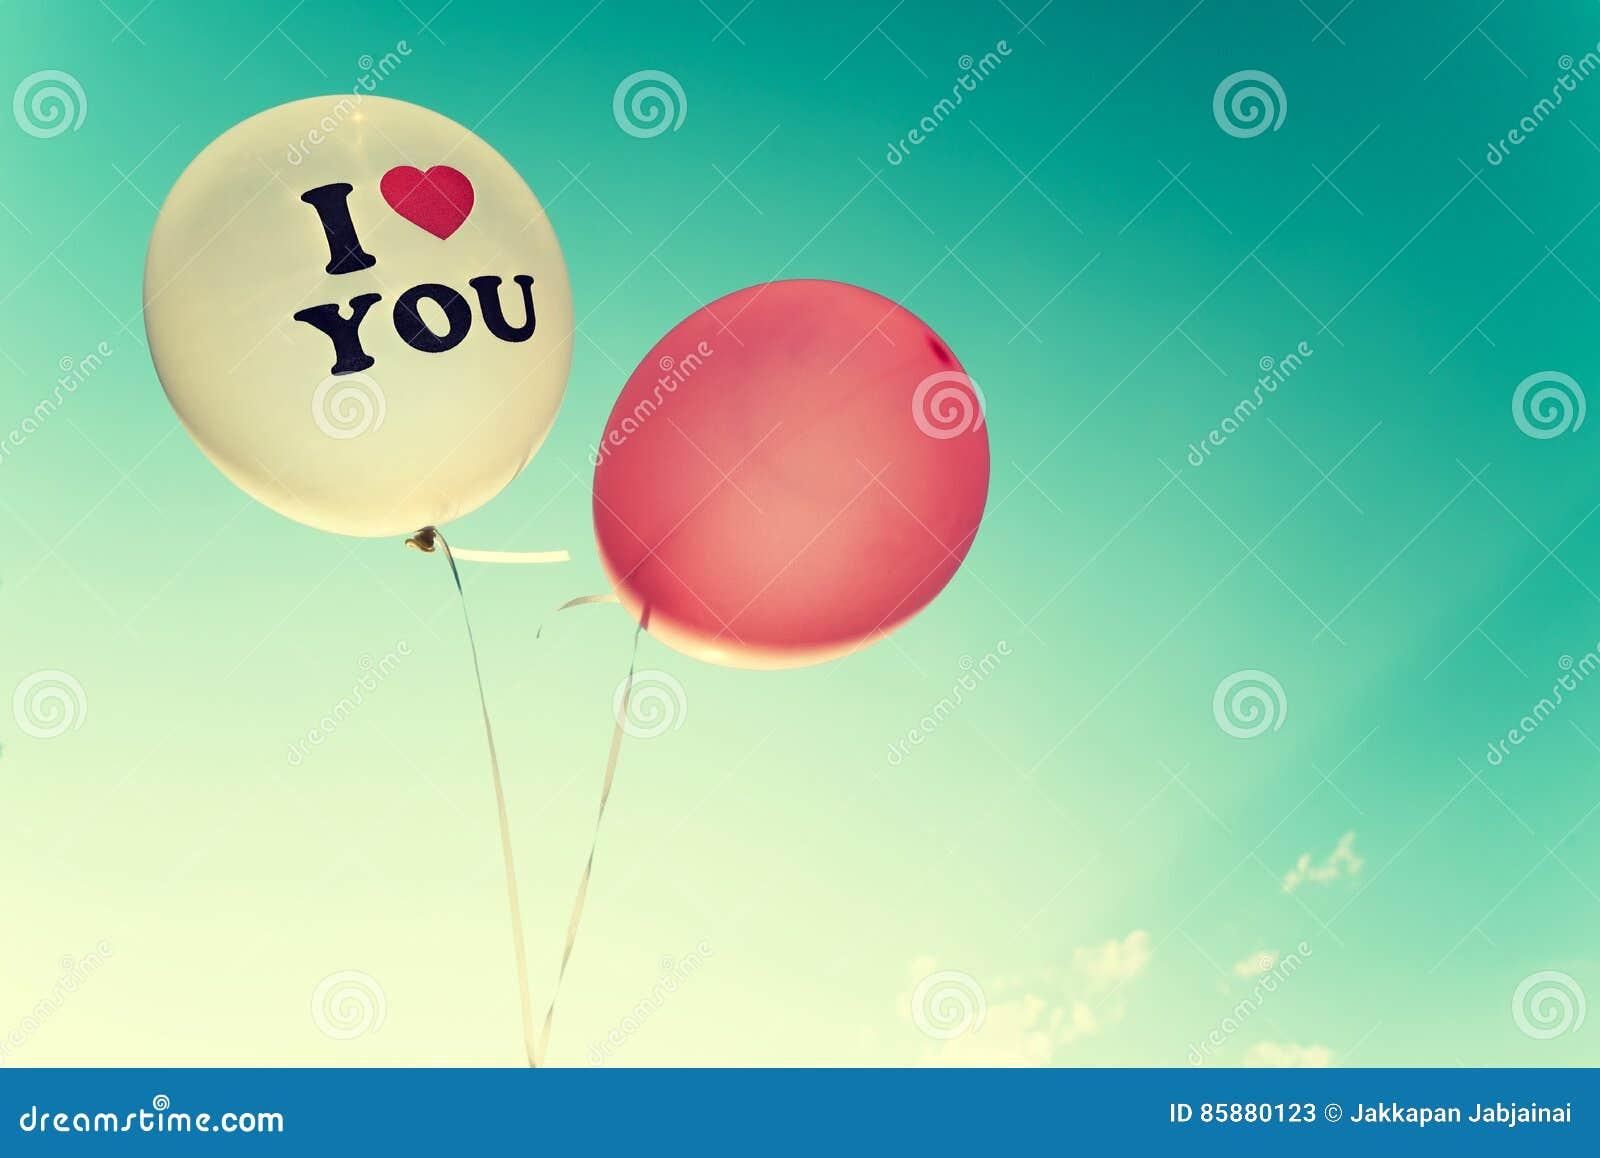 Vintage Balloon Love Symbol In Valentine Day Stock Image Image